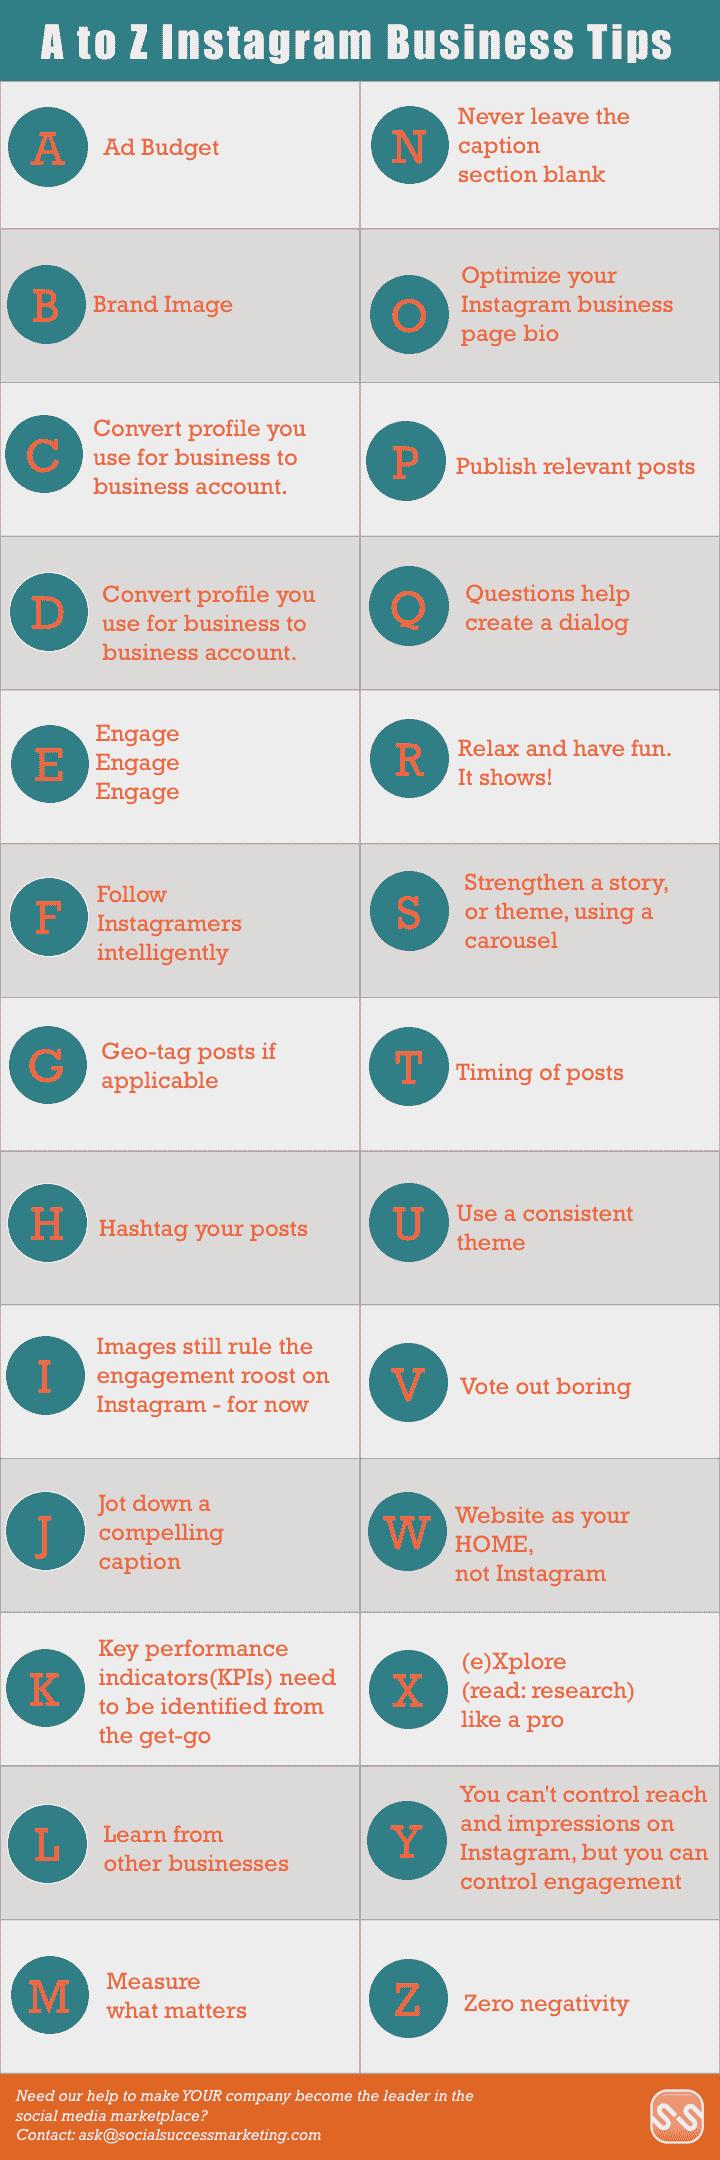 Instagram Business Tips